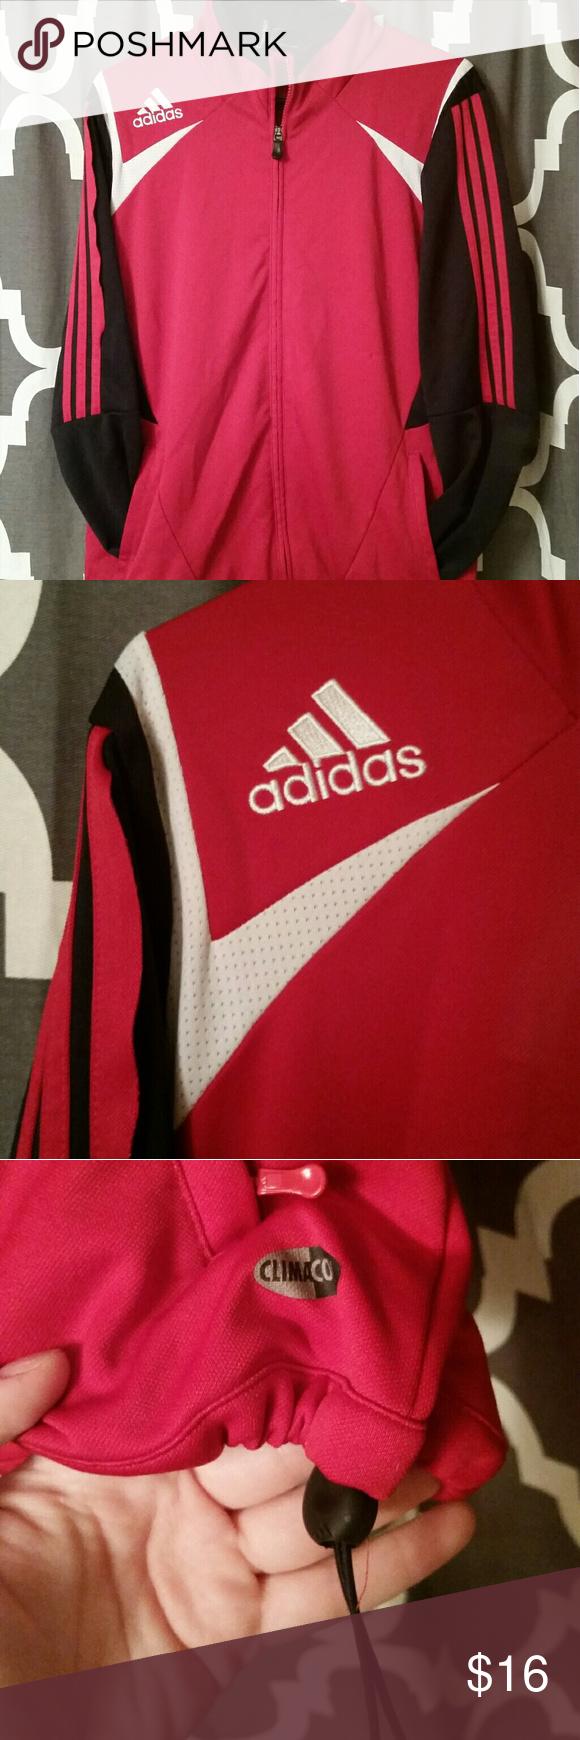 Adidas sports jacket Red clima365 Adidas jacket. Adjustable